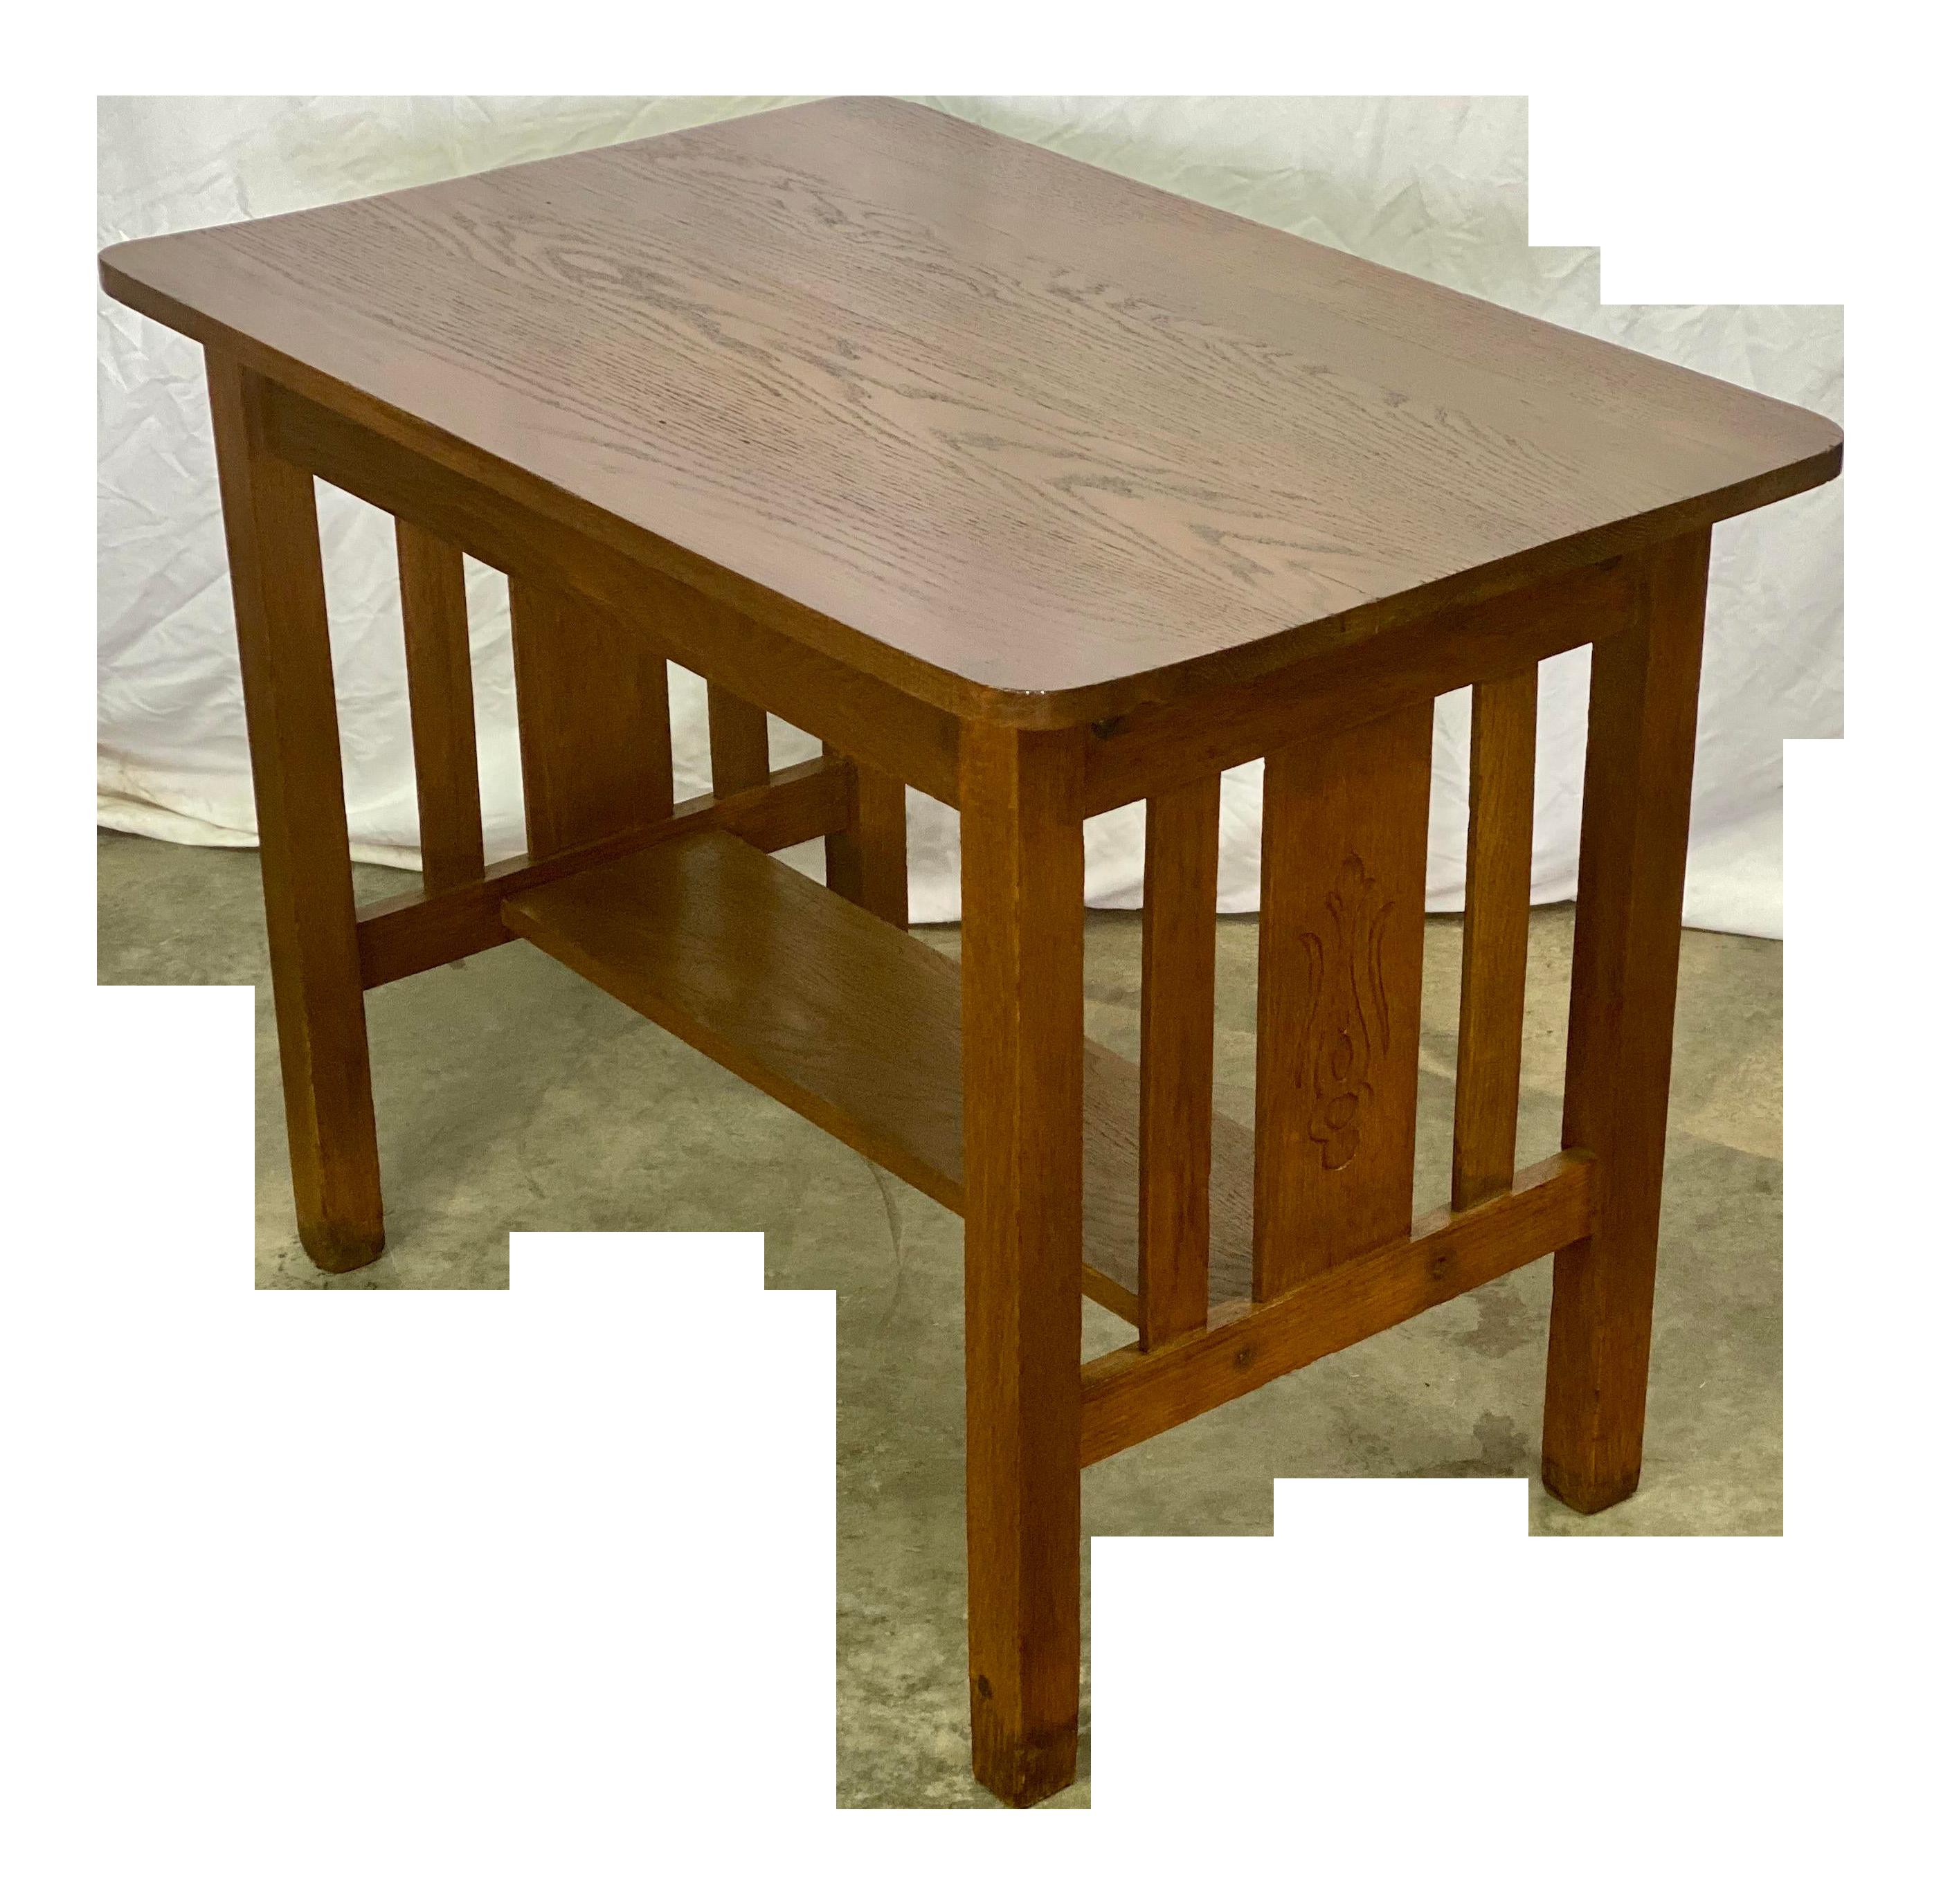 Antique Rustic American Oak Mission Style Writing Desk Chairish